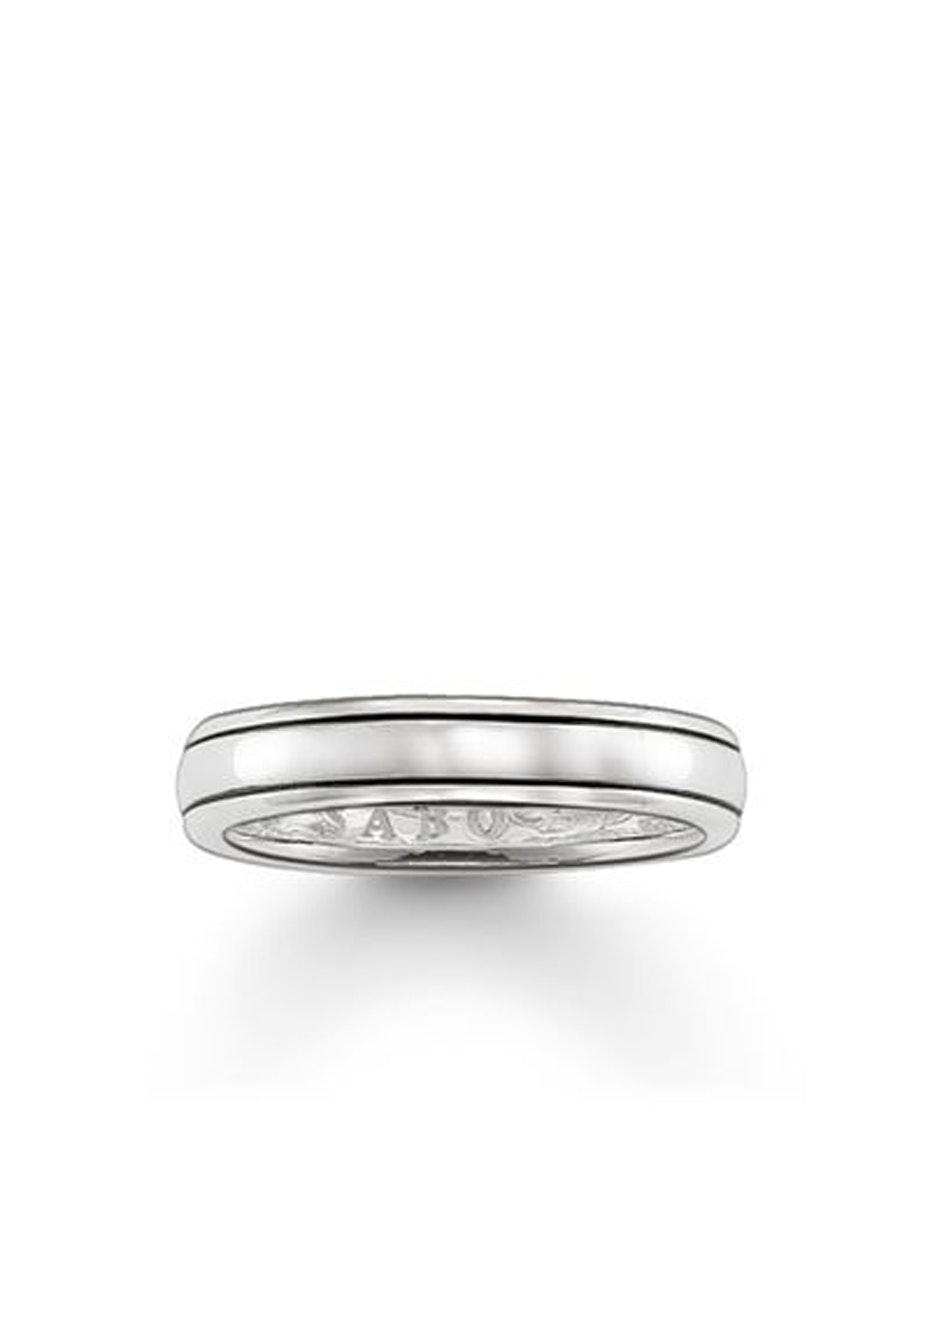 Thomas Sabo  - Twin Line Oxidised Ring